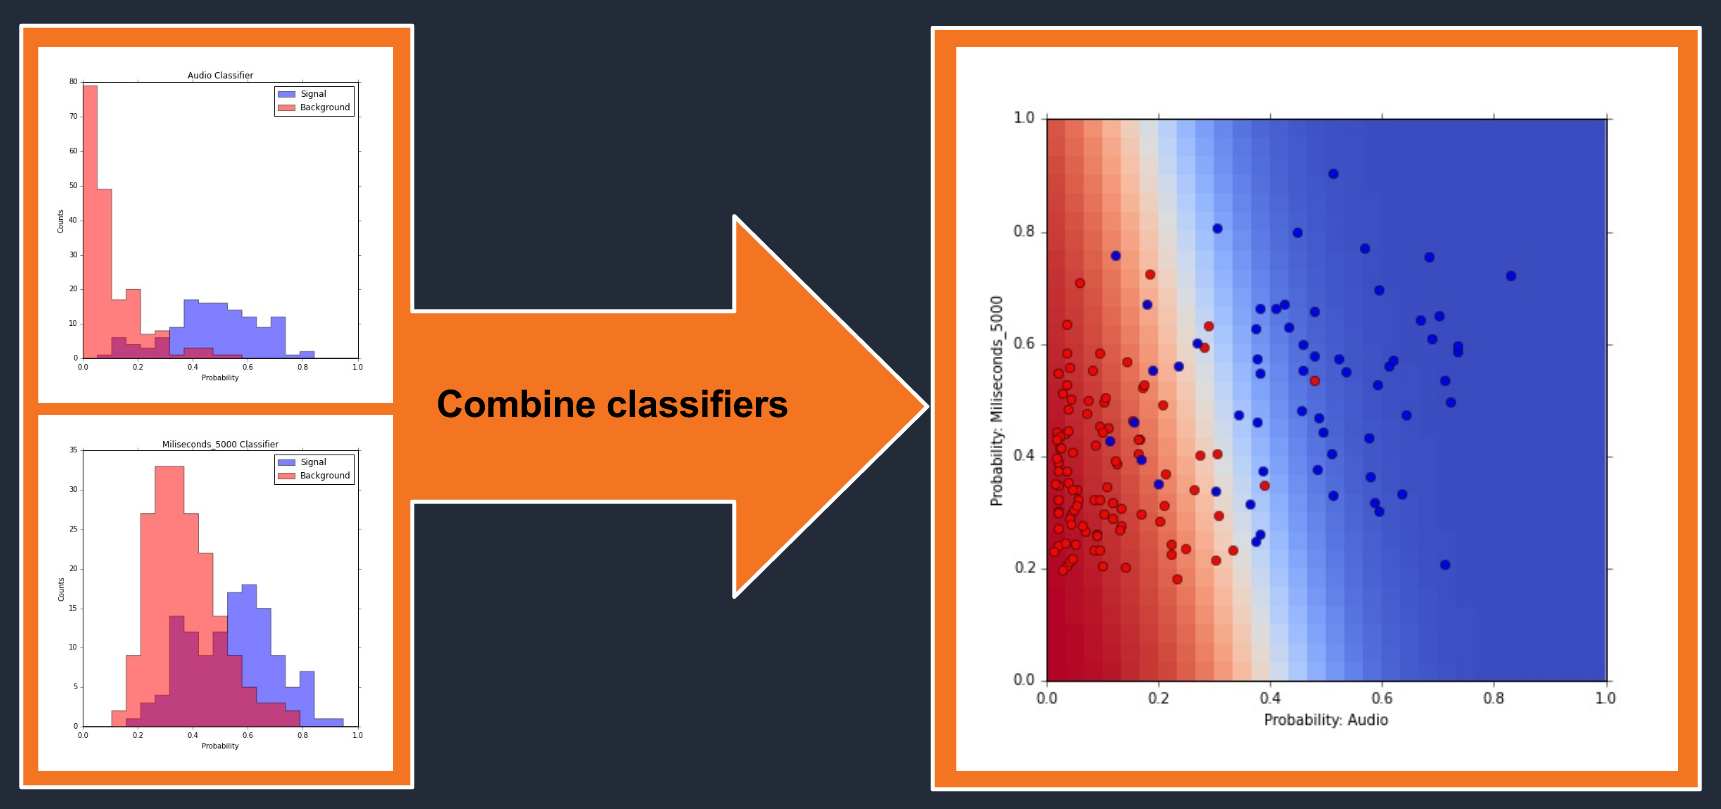 combined classifiers